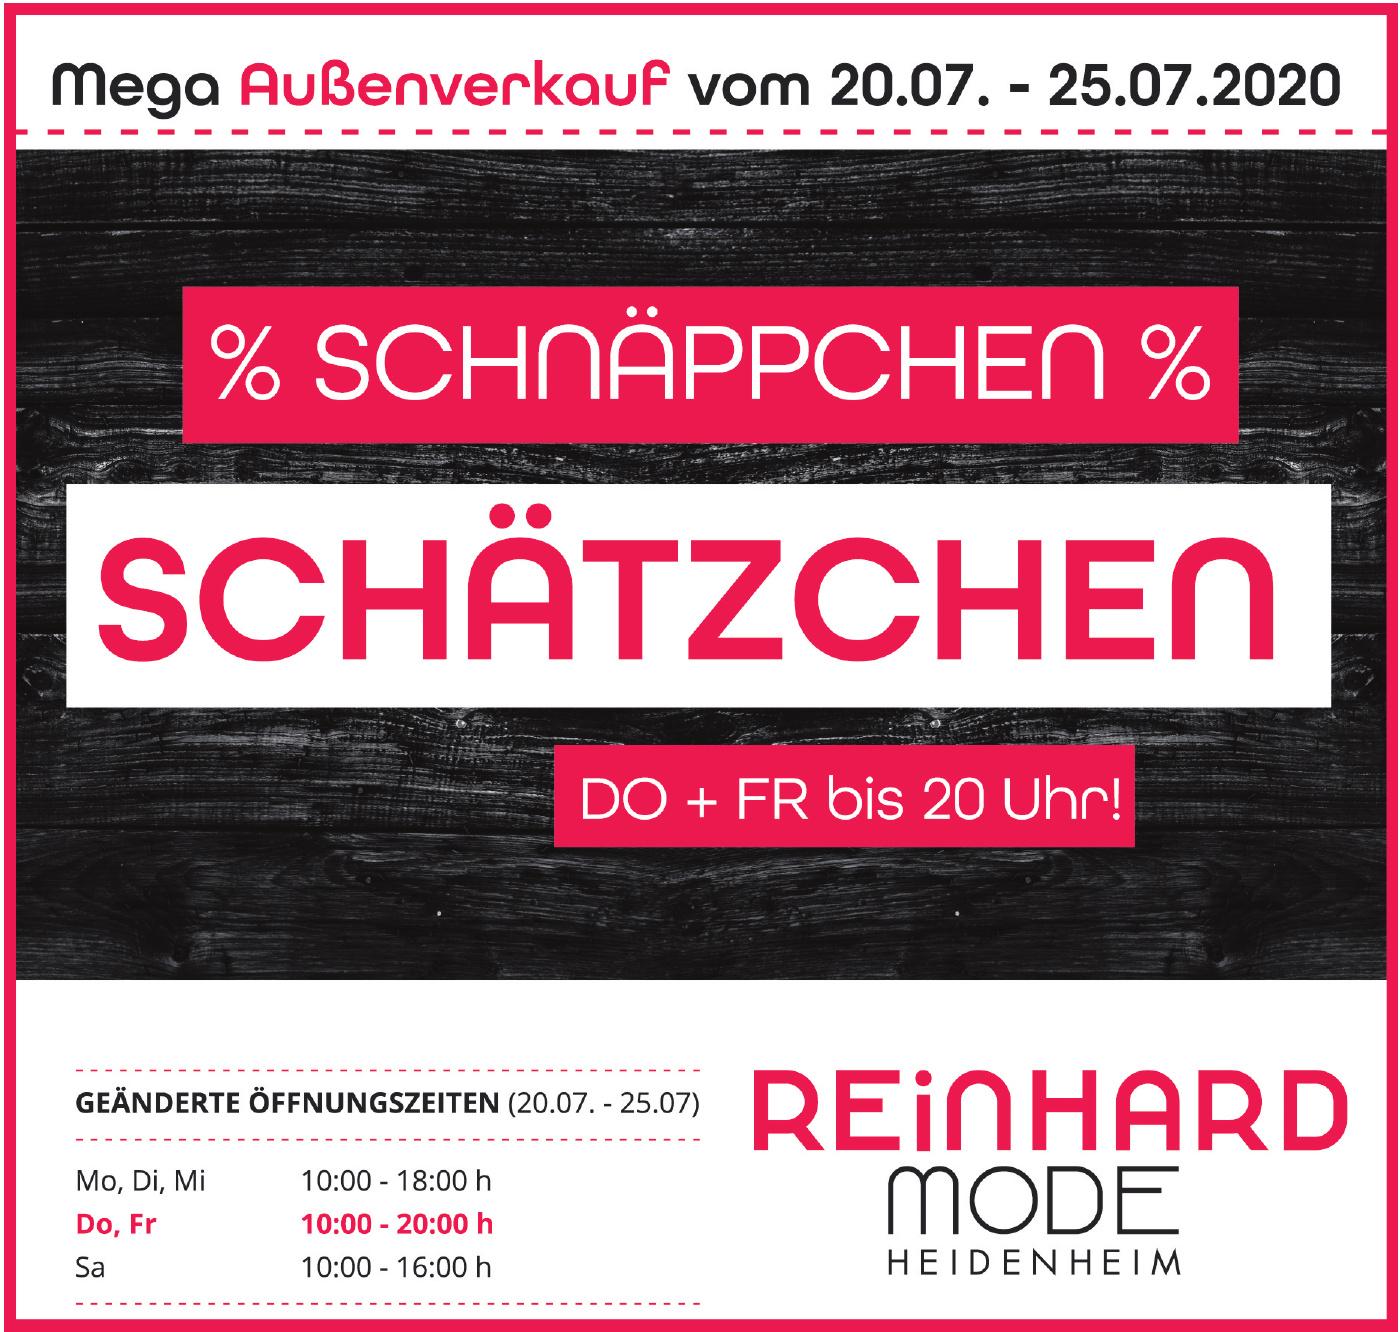 Reinhard Mode Heidenheim